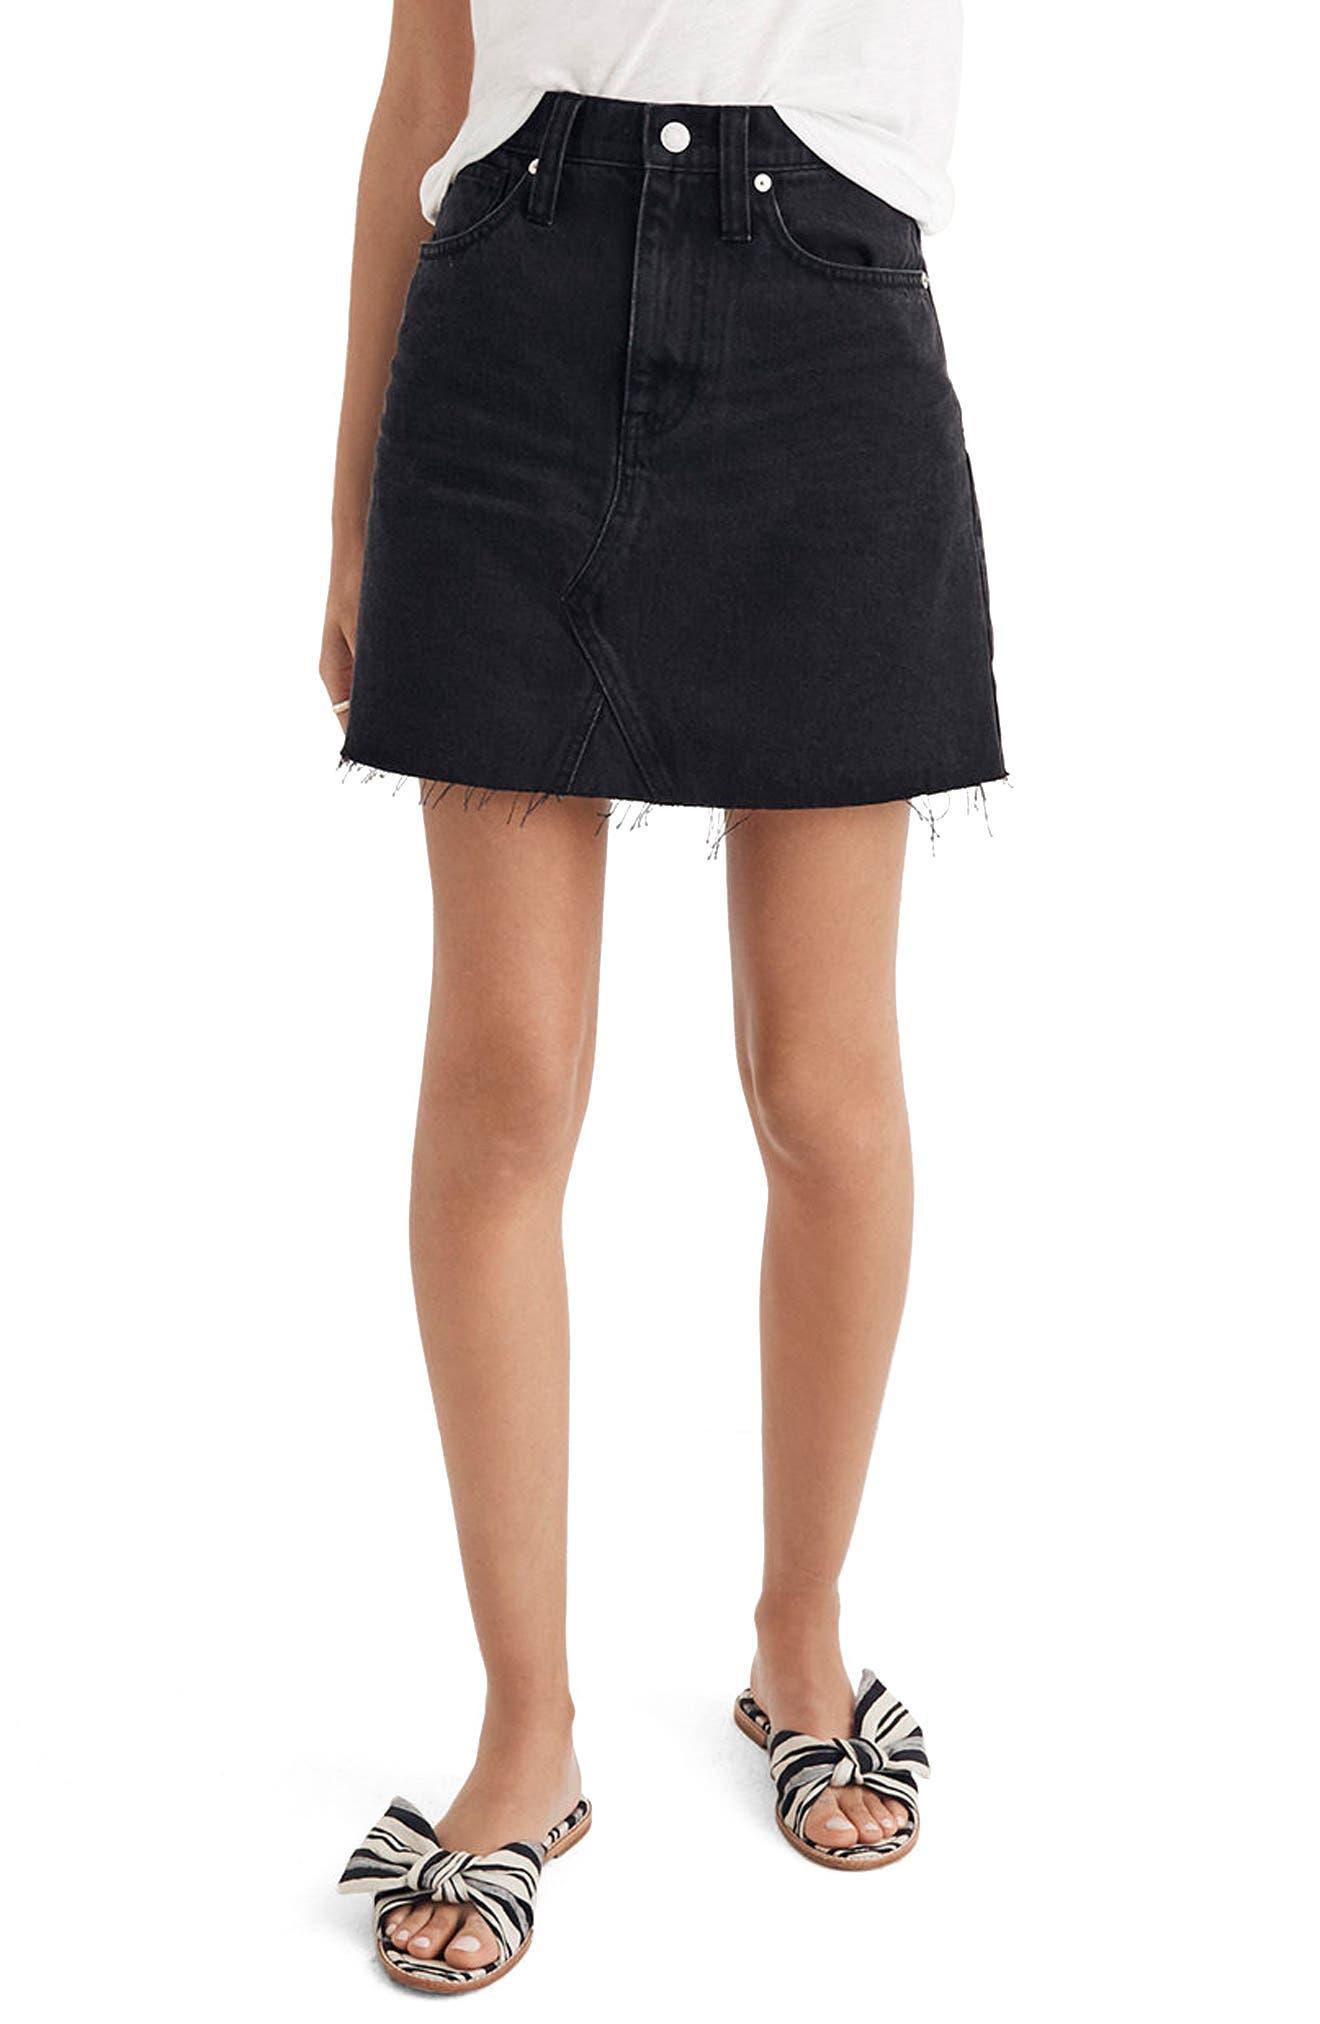 Frisco Denim Miniskirt,                             Main thumbnail 1, color,                             001